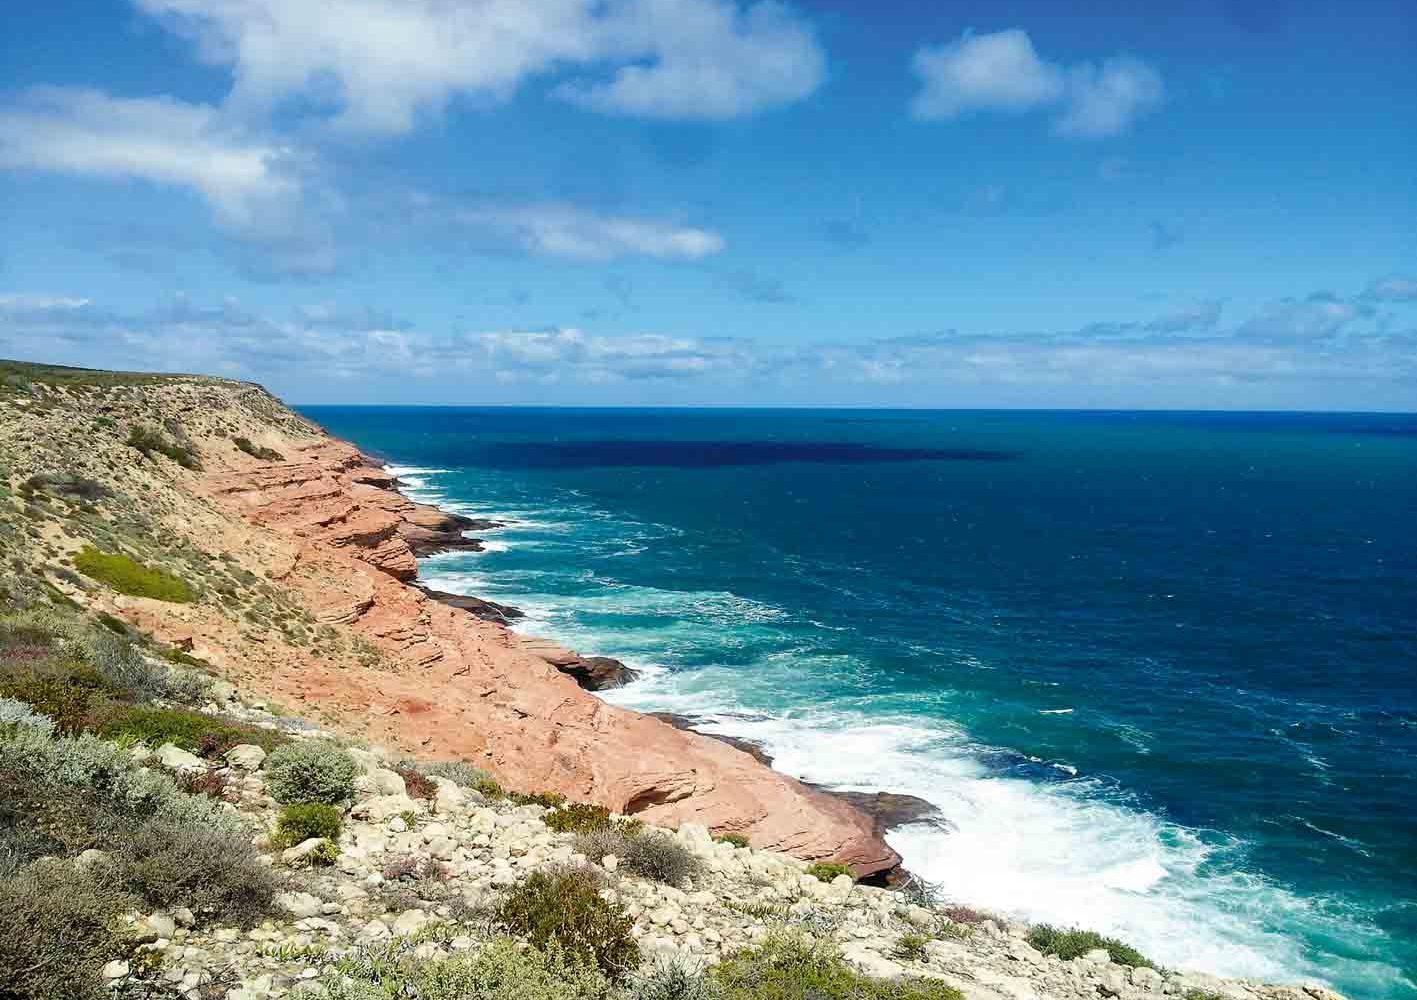 Wanderung entlang der spektakulären Küste, West-Australien